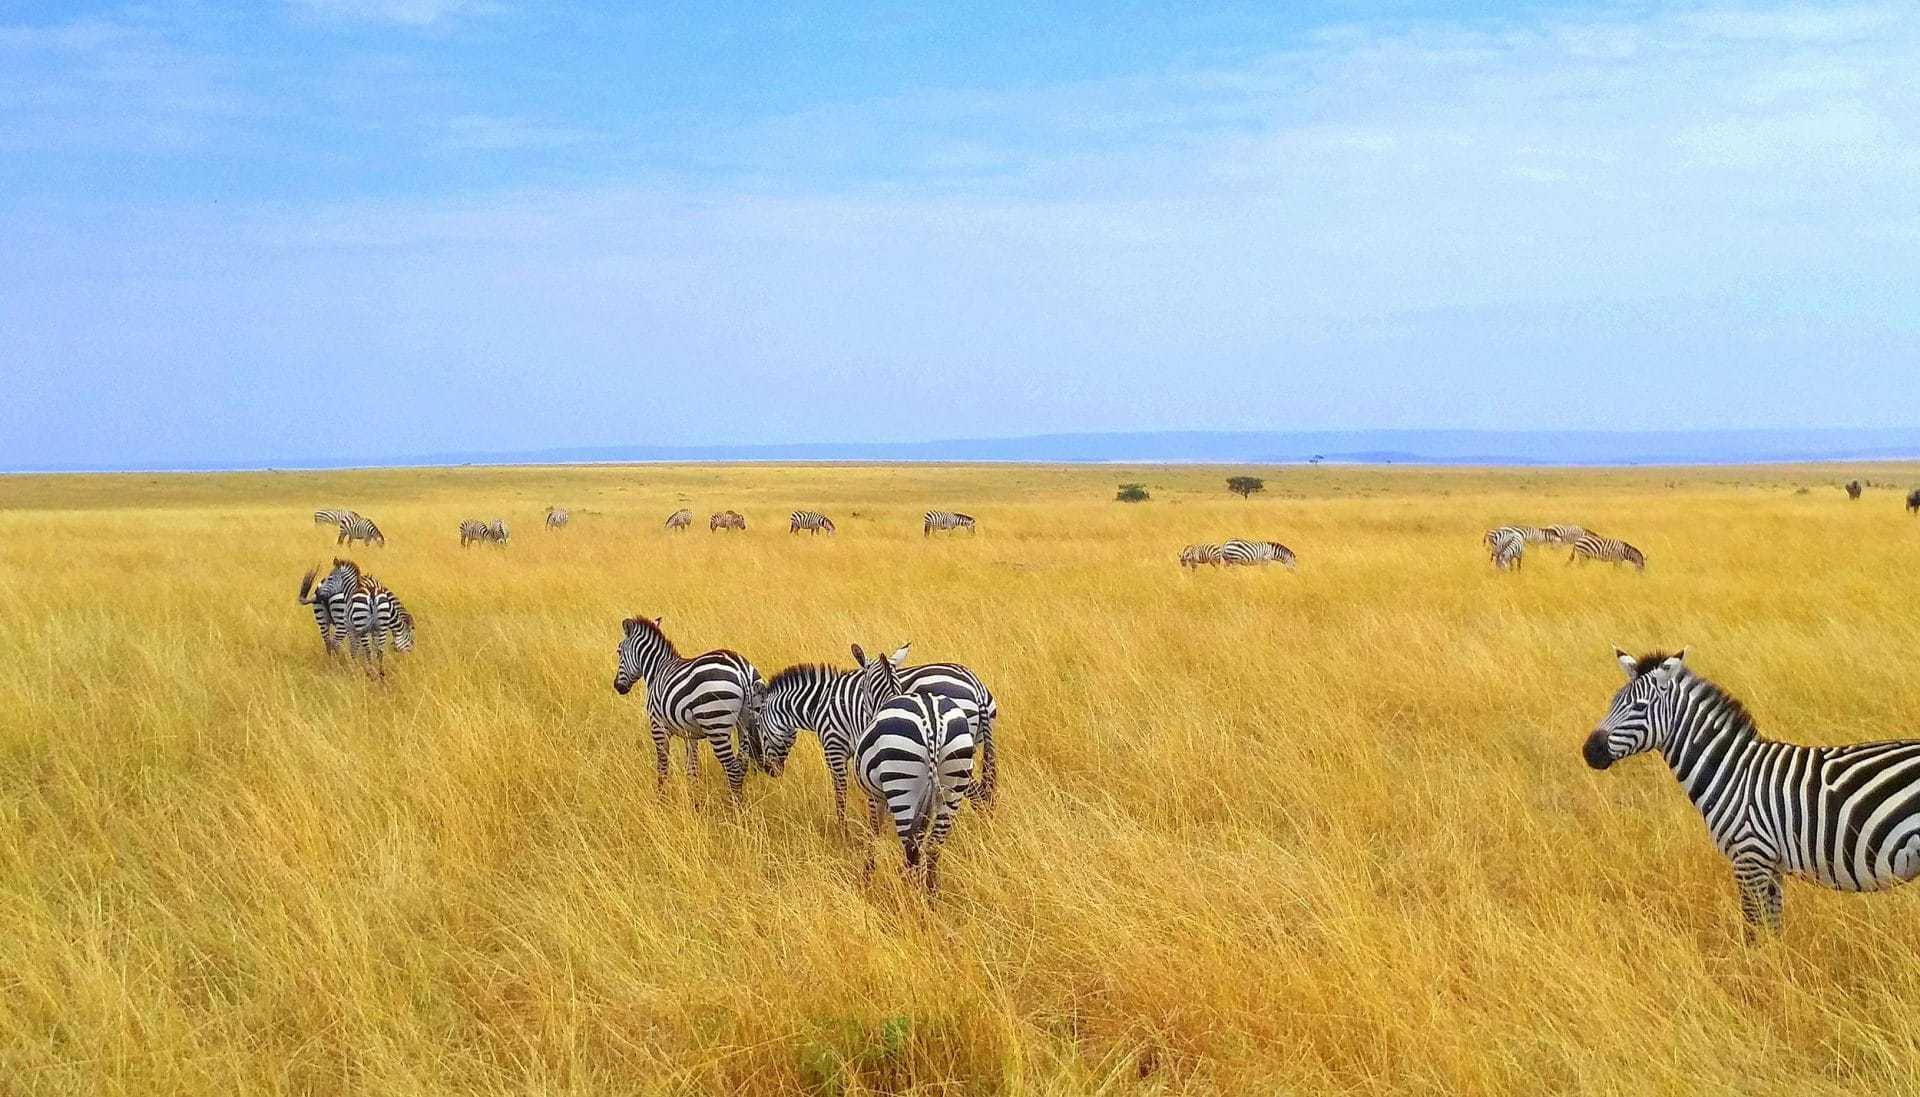 10 cose da sapere sul Kenya prima di partire